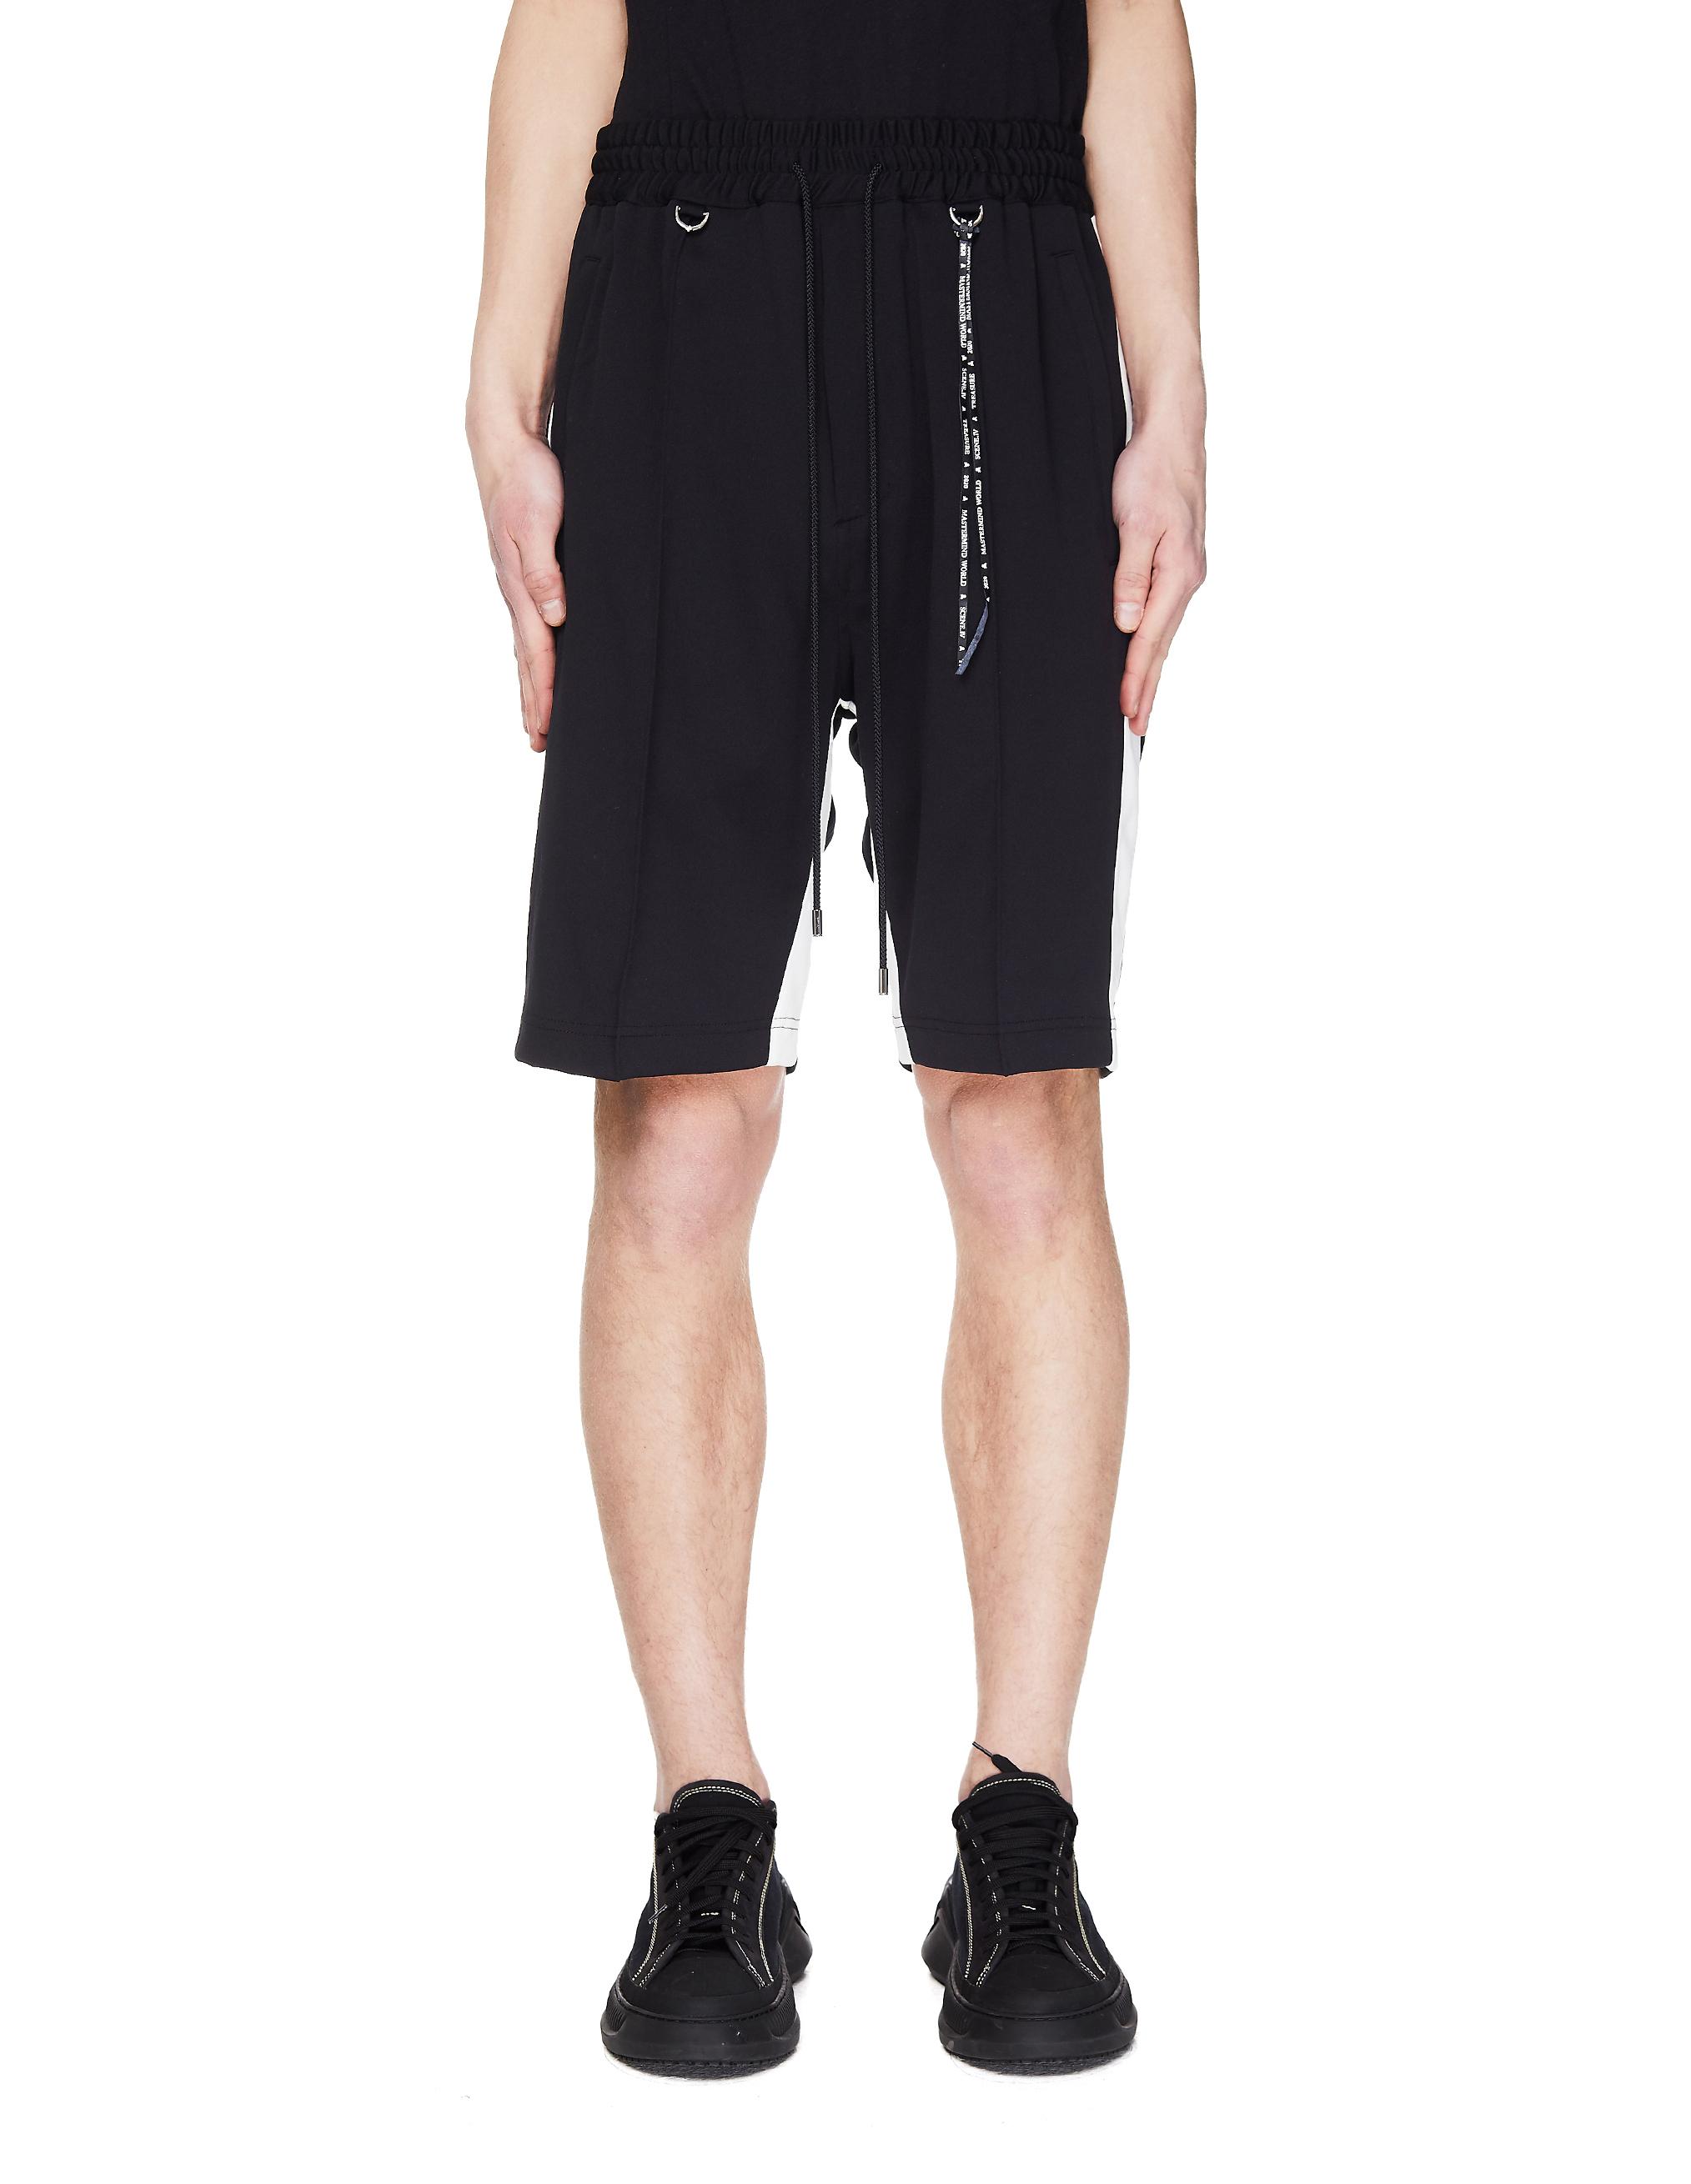 Mastermind WORLD Black Scull Printed Shorts